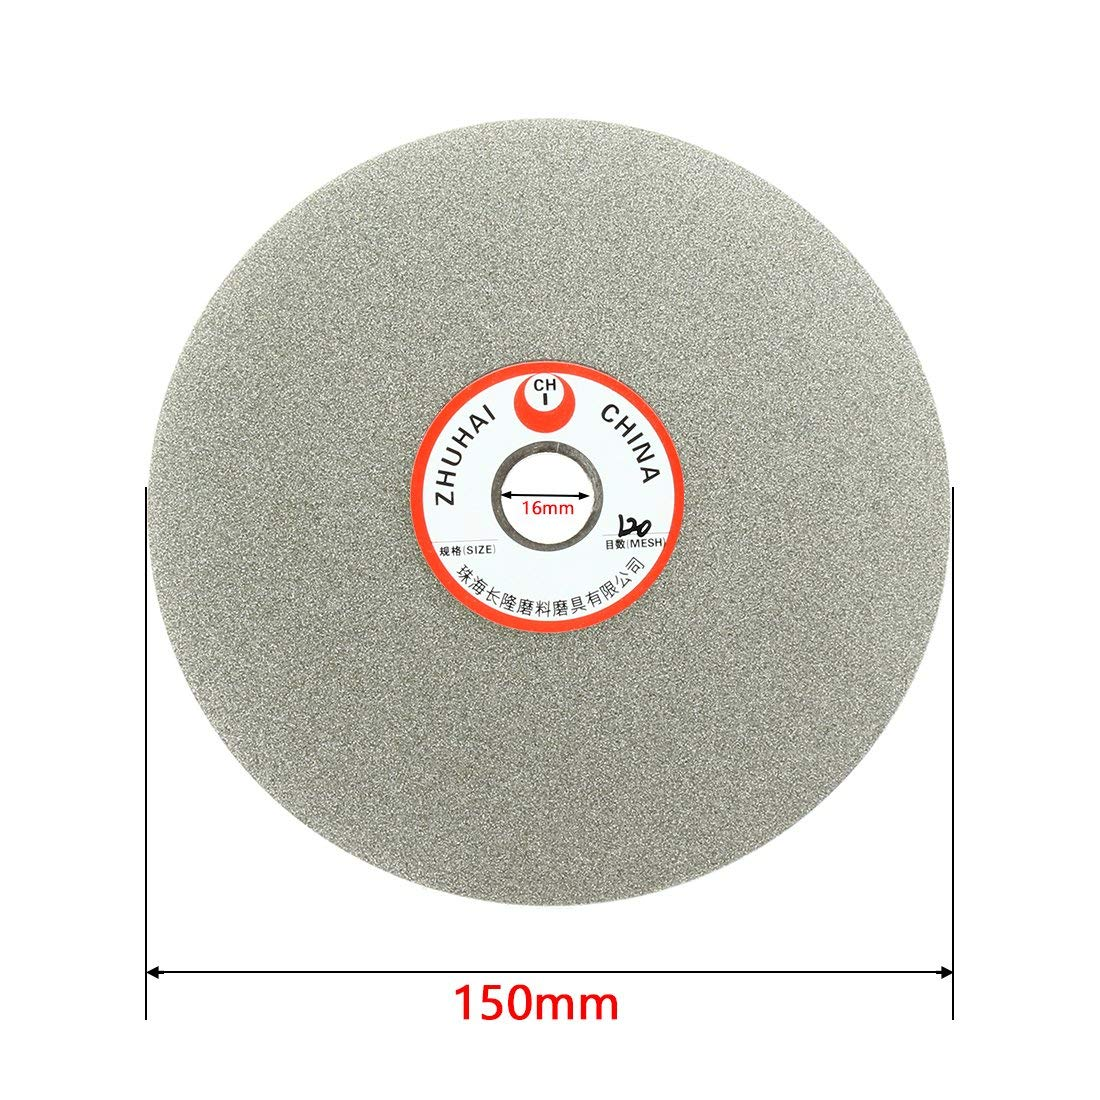 Sourcingmap 6-inch Grit 1000 Diamond Coated Flat Lap Wheel Grinding Disc Polishing Tool